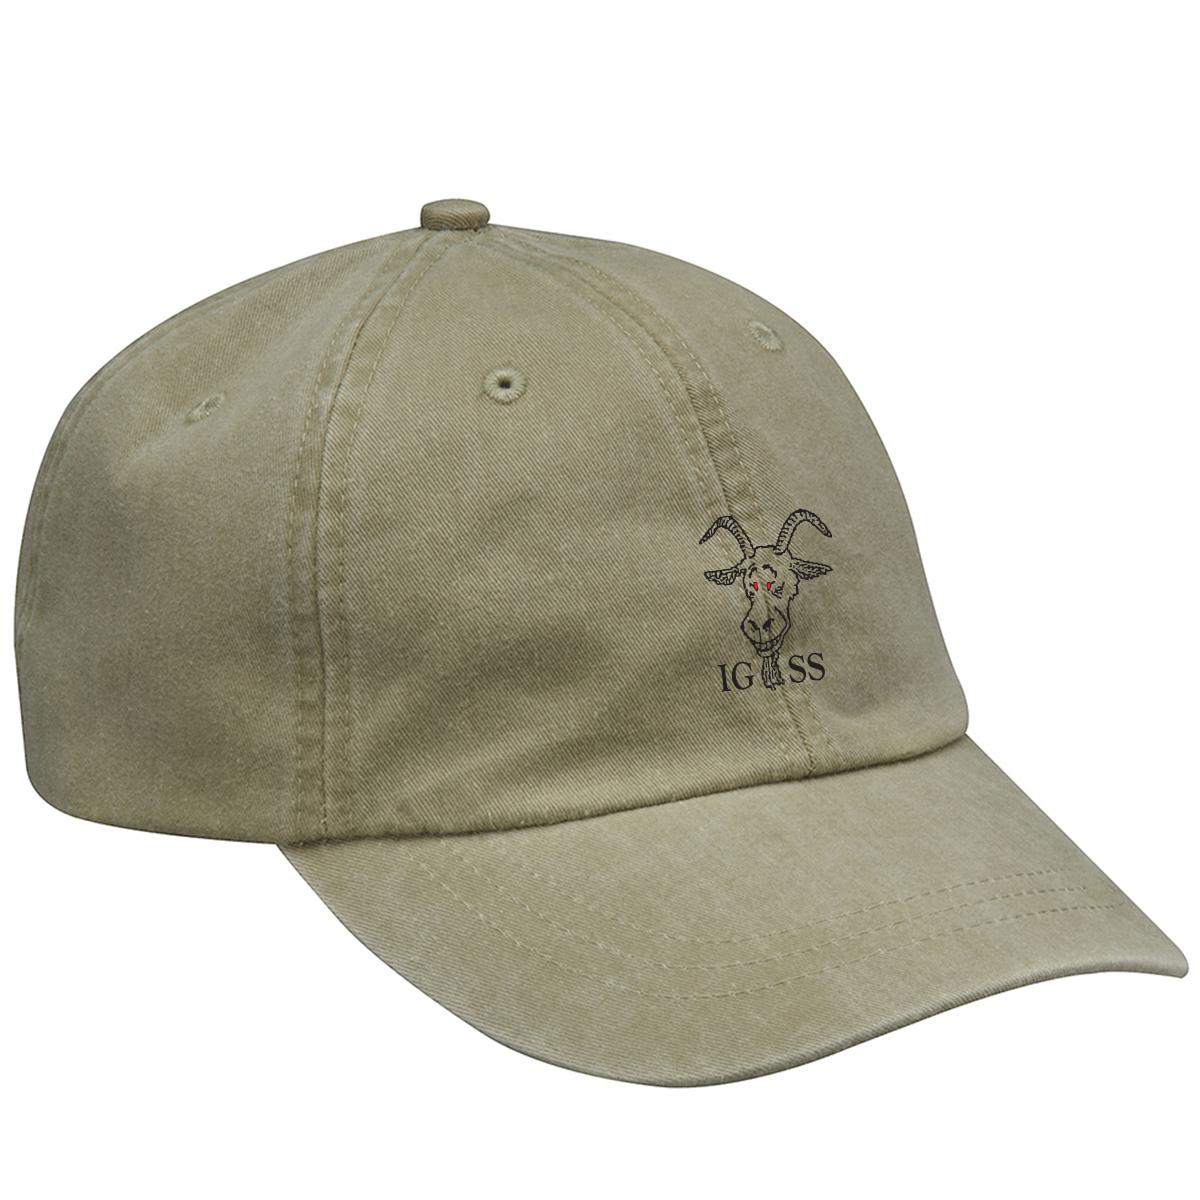 Island Goats Sailing Society - Adams Optimum Pigment-Dyed Hat